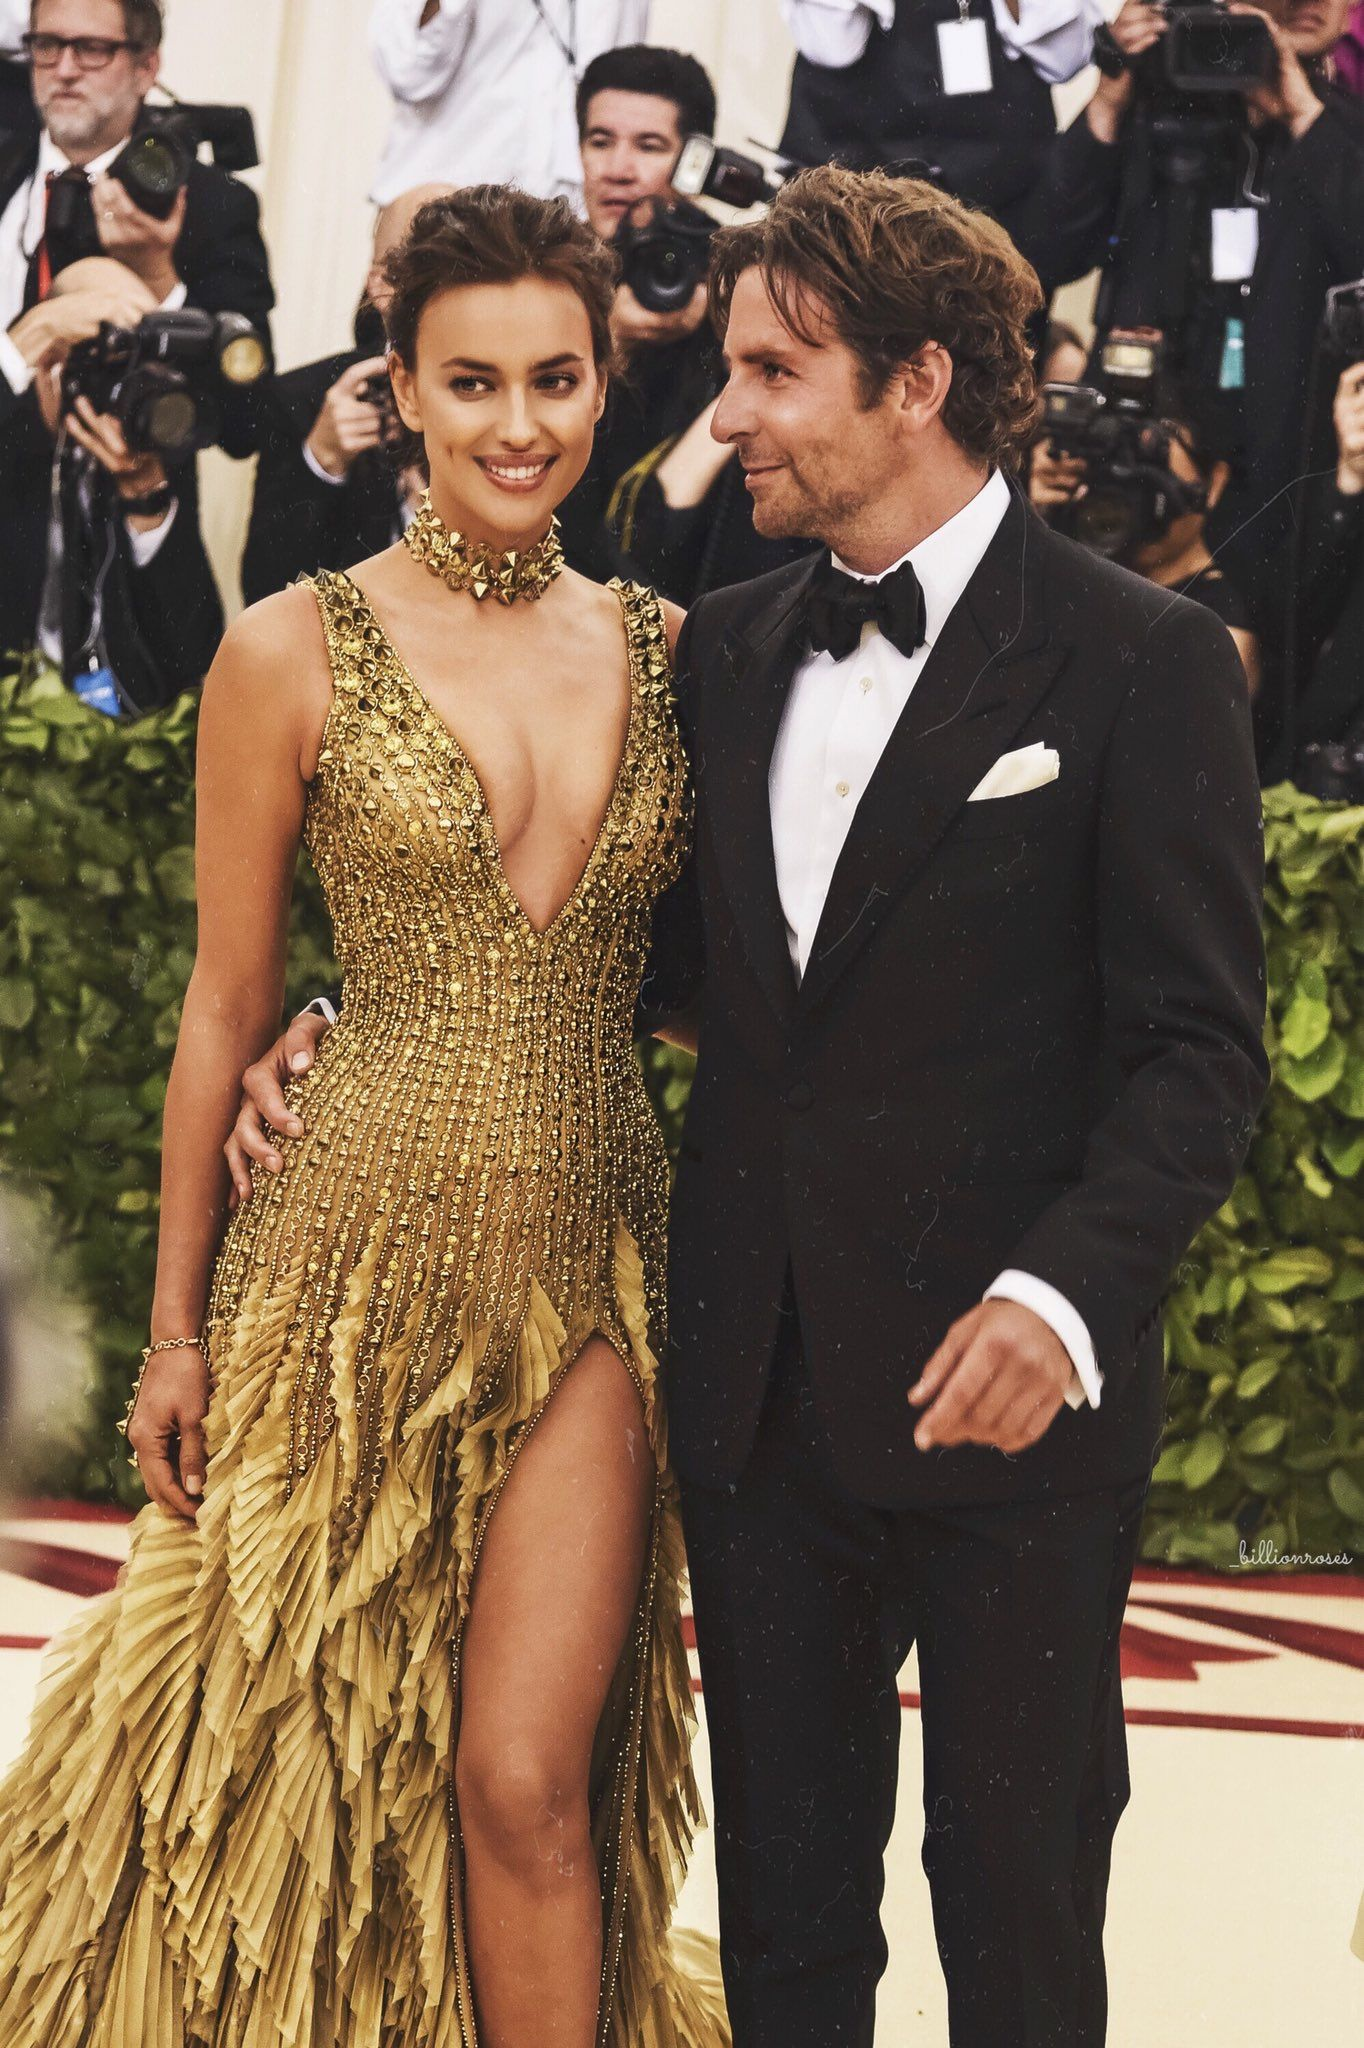 Irina Shayk In Versace And Bradley Cooper In Tom Ford 2018 Met Gala Dresses Irina Shayk Met Gala Looks